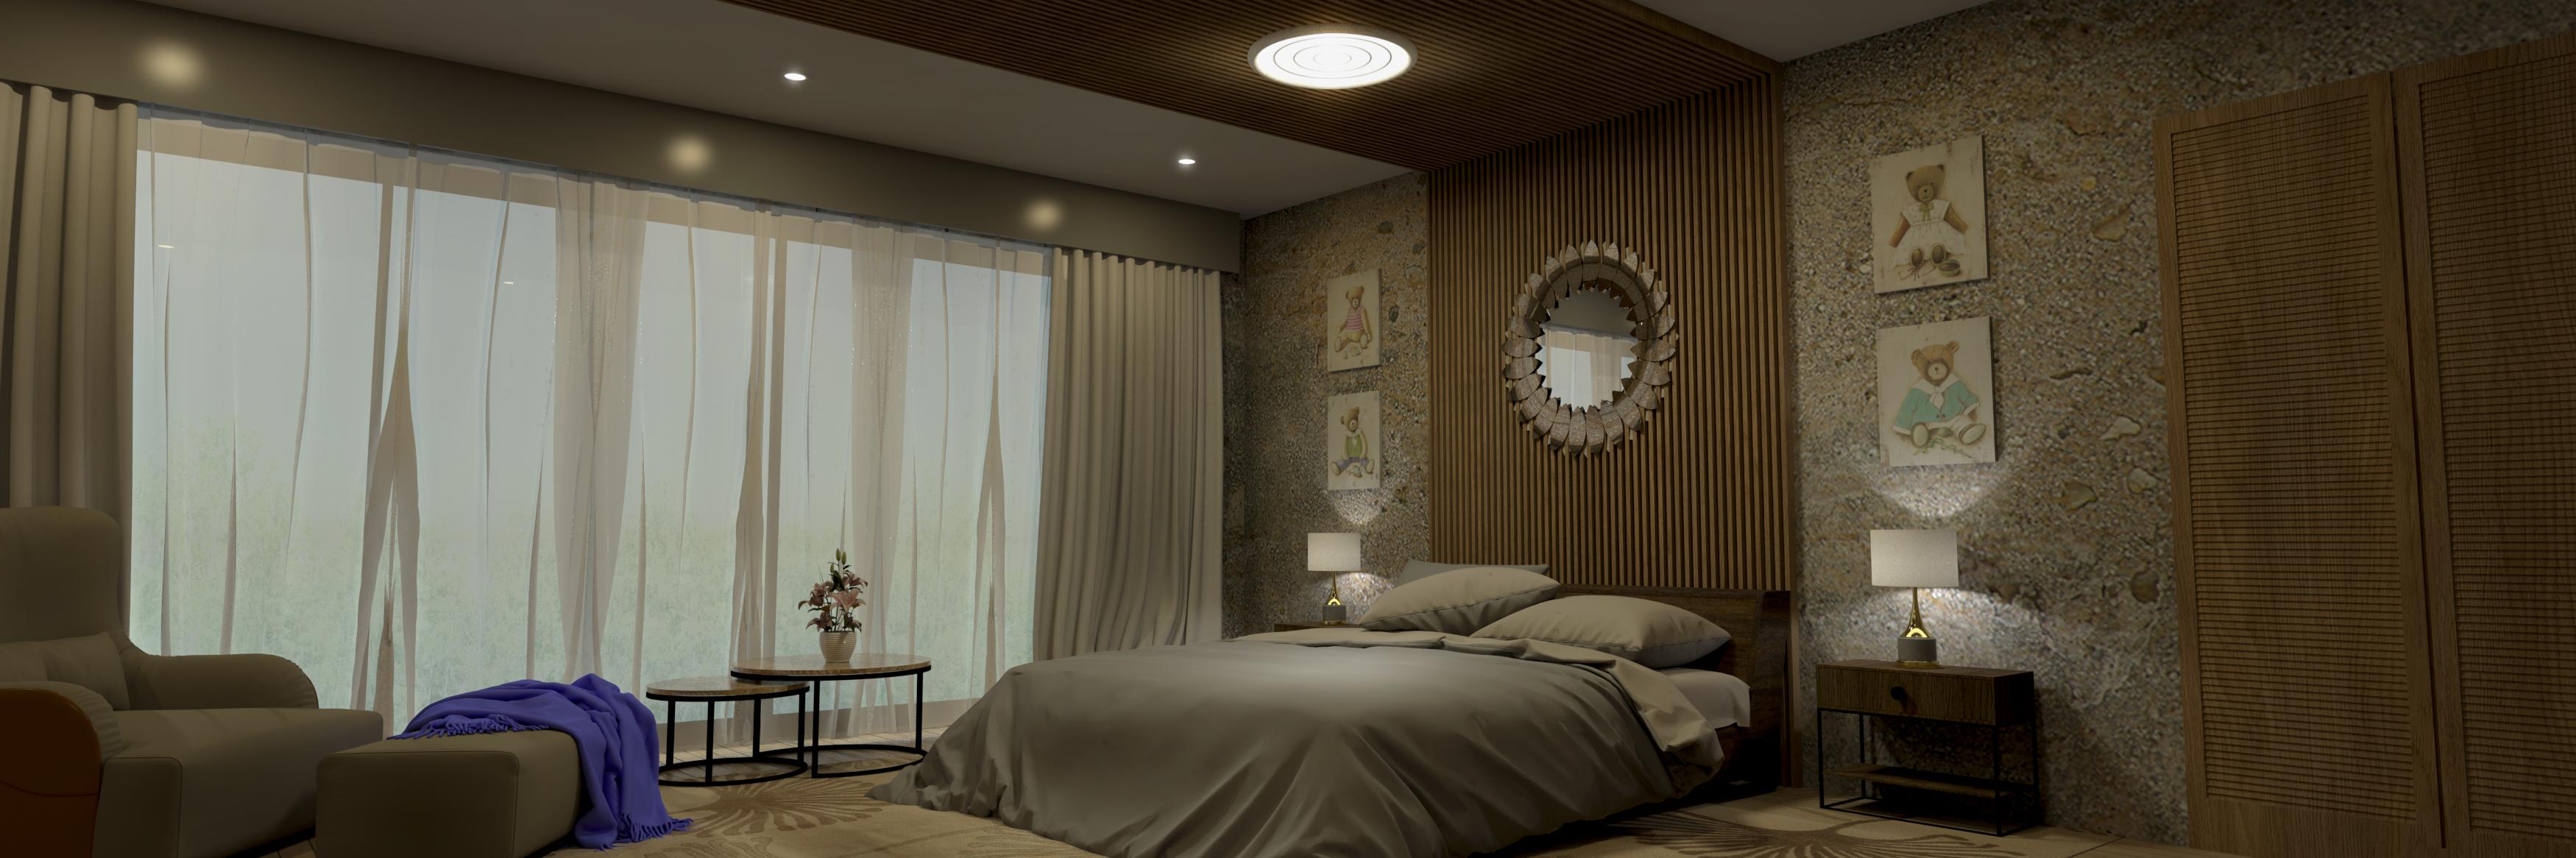 Soveværelse_130219